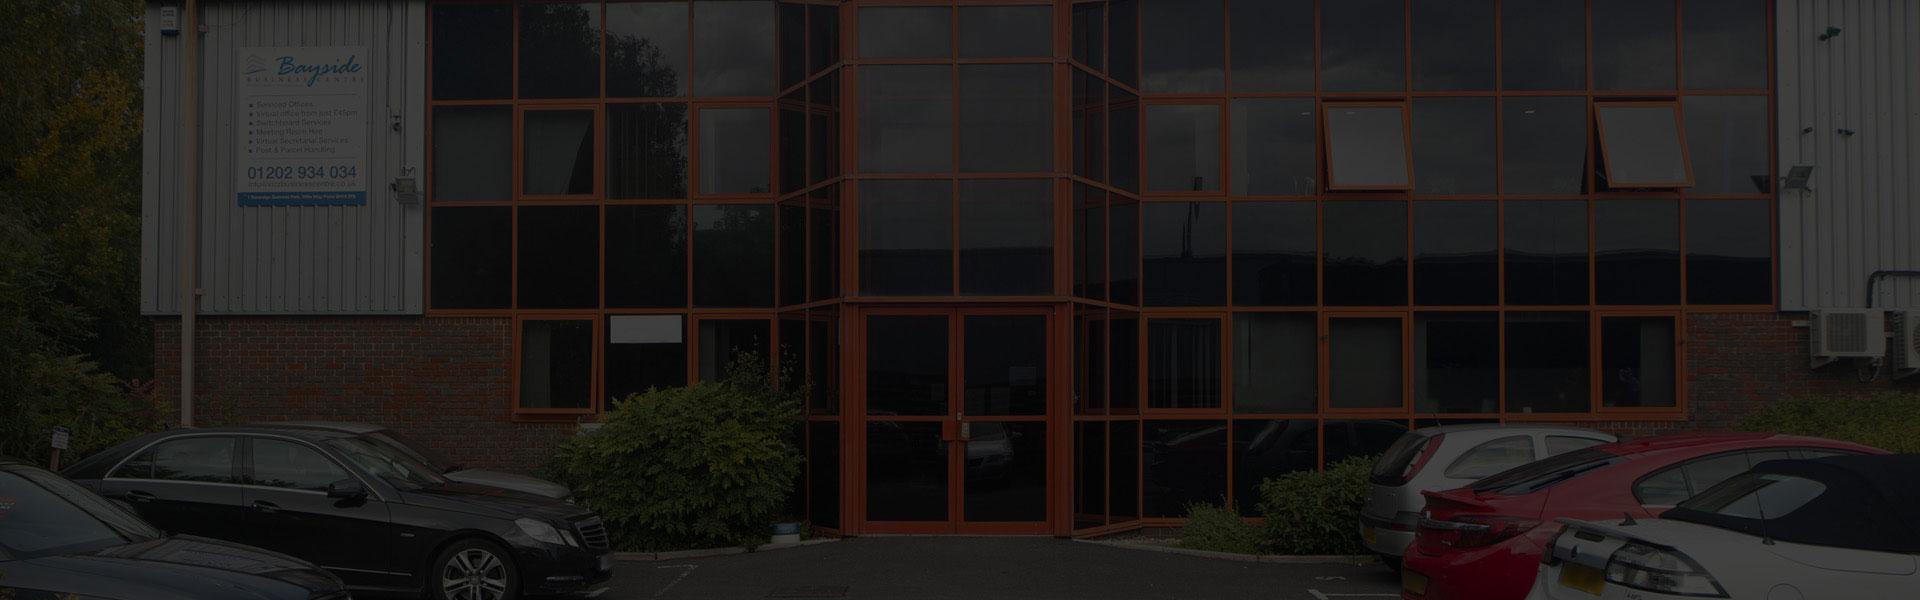 offices-exterior-dimmed-slide